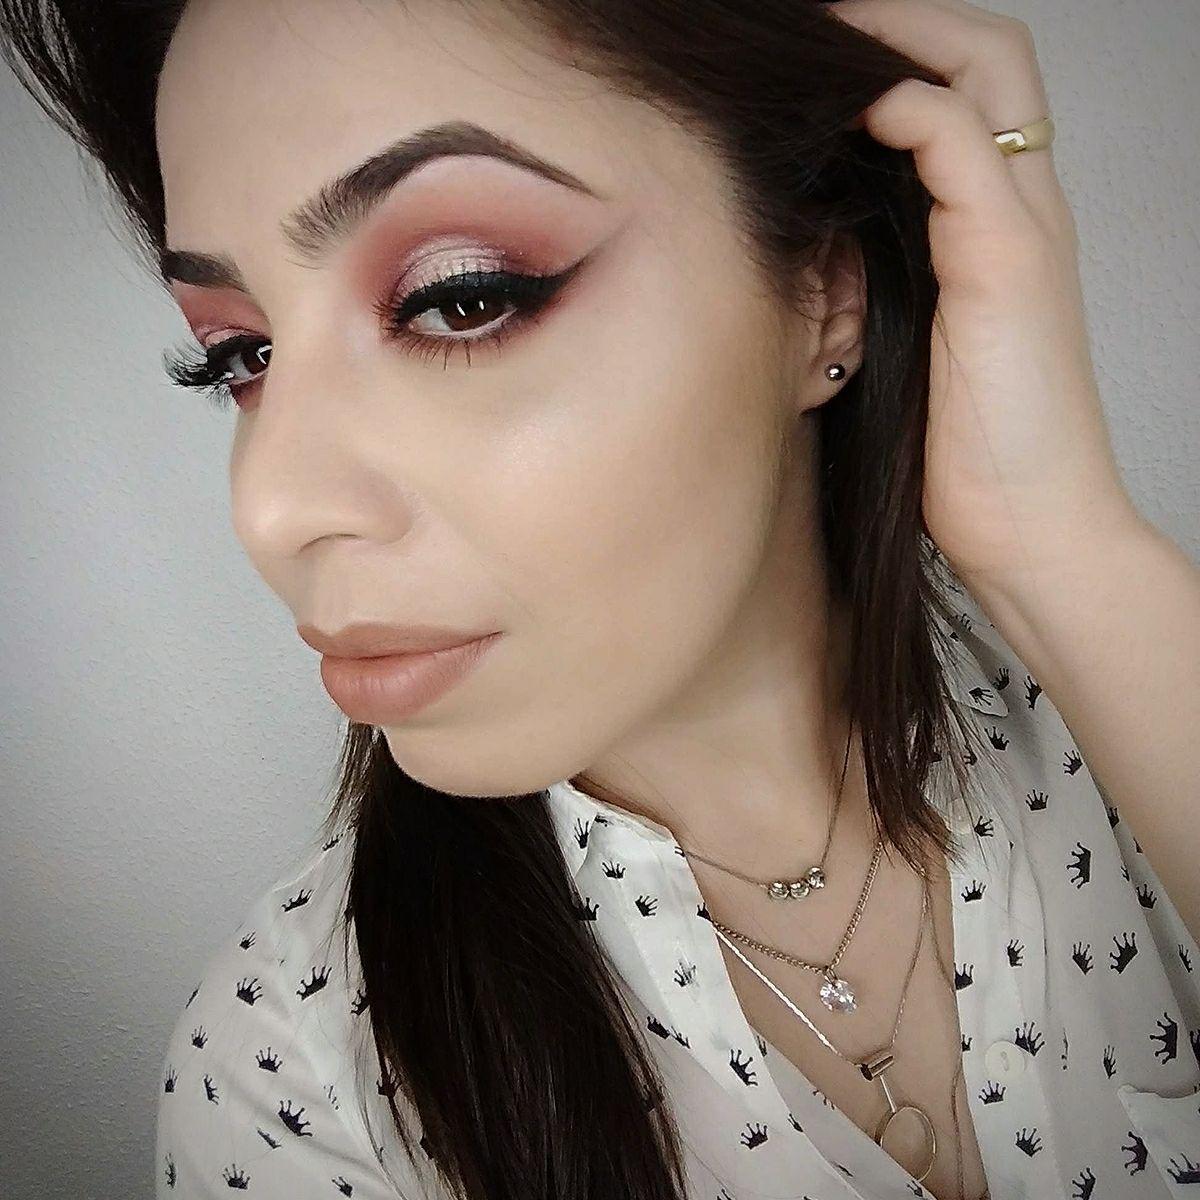 Pálpebra Luz Rosa e Marsala maquiagem maquiador(a) consultor(a)